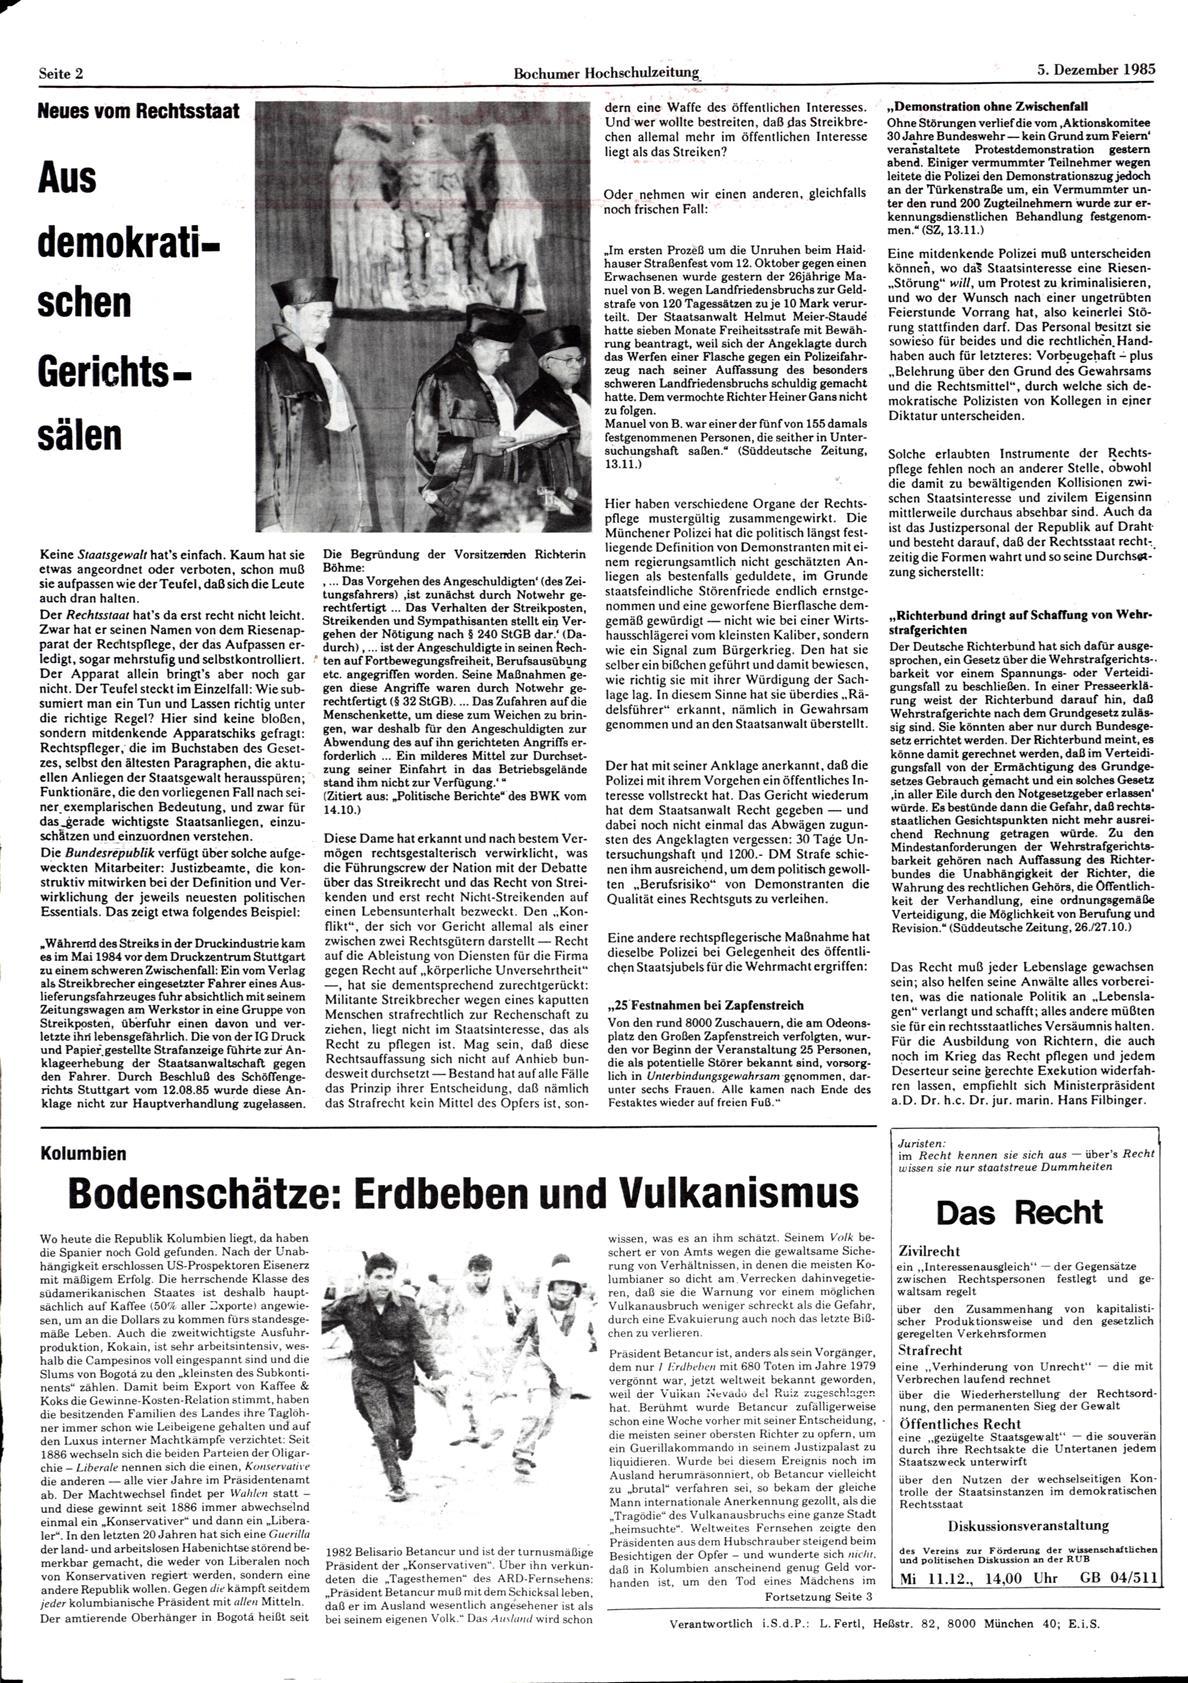 Bochum_BHZ_19851203_120_002